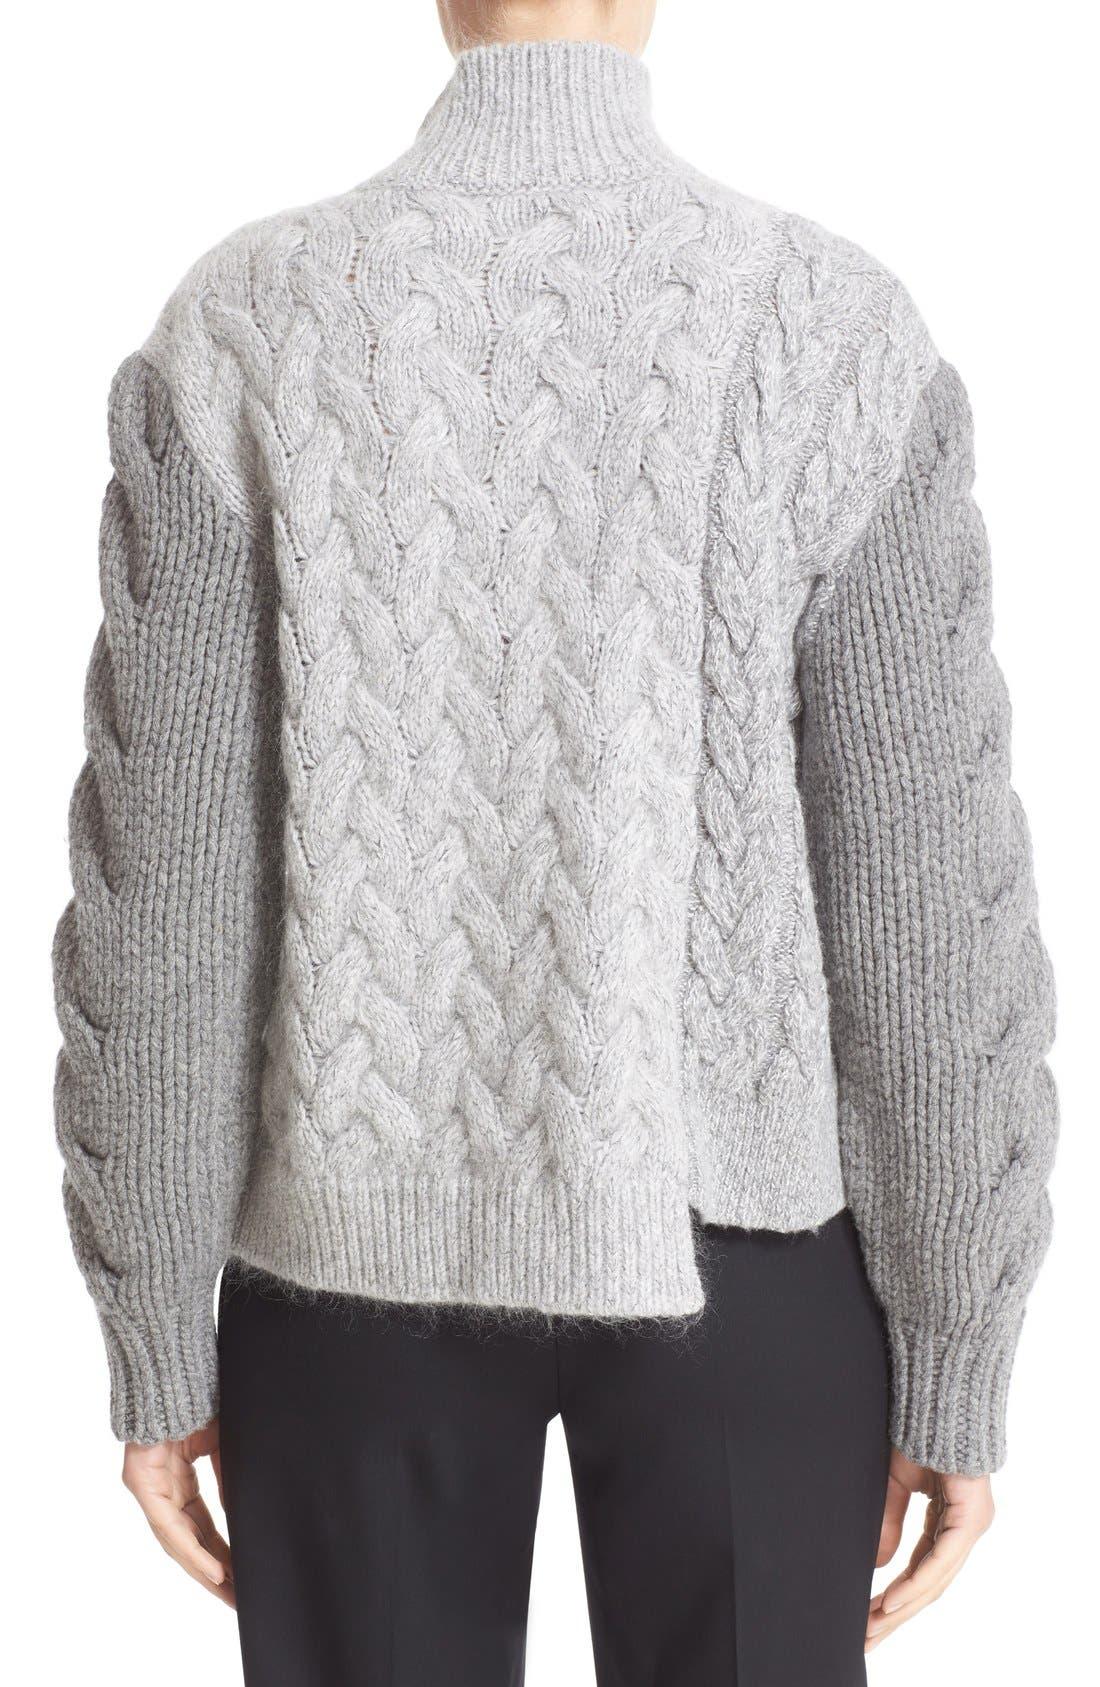 STELLA MCCARTNEY, Mixed Media Turtleneck Sweater, Alternate thumbnail 2, color, 120